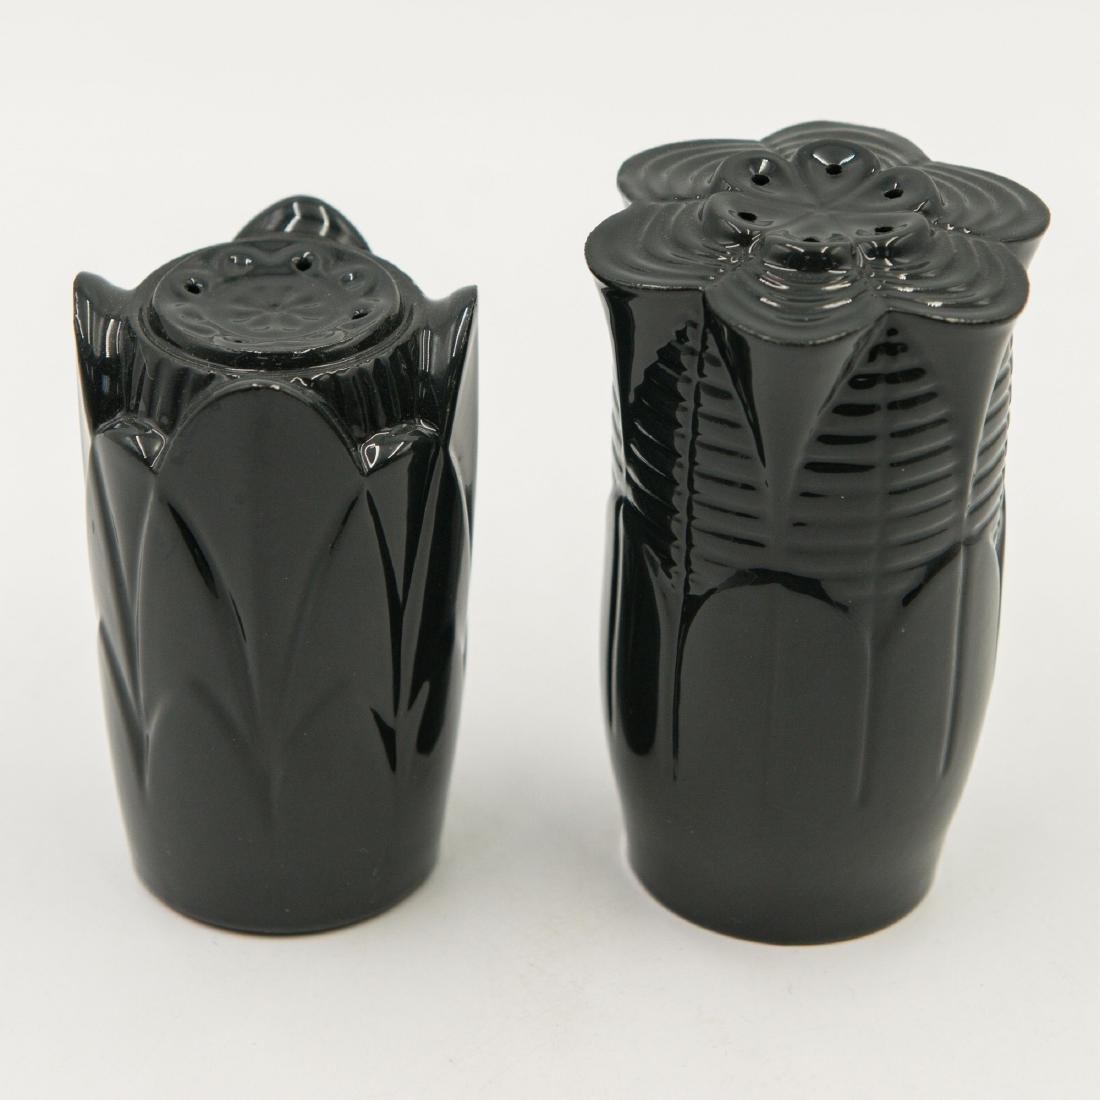 LLADRO NATUROFANTASTIC SALT & PEPPER SHAKERS BLACK - 2